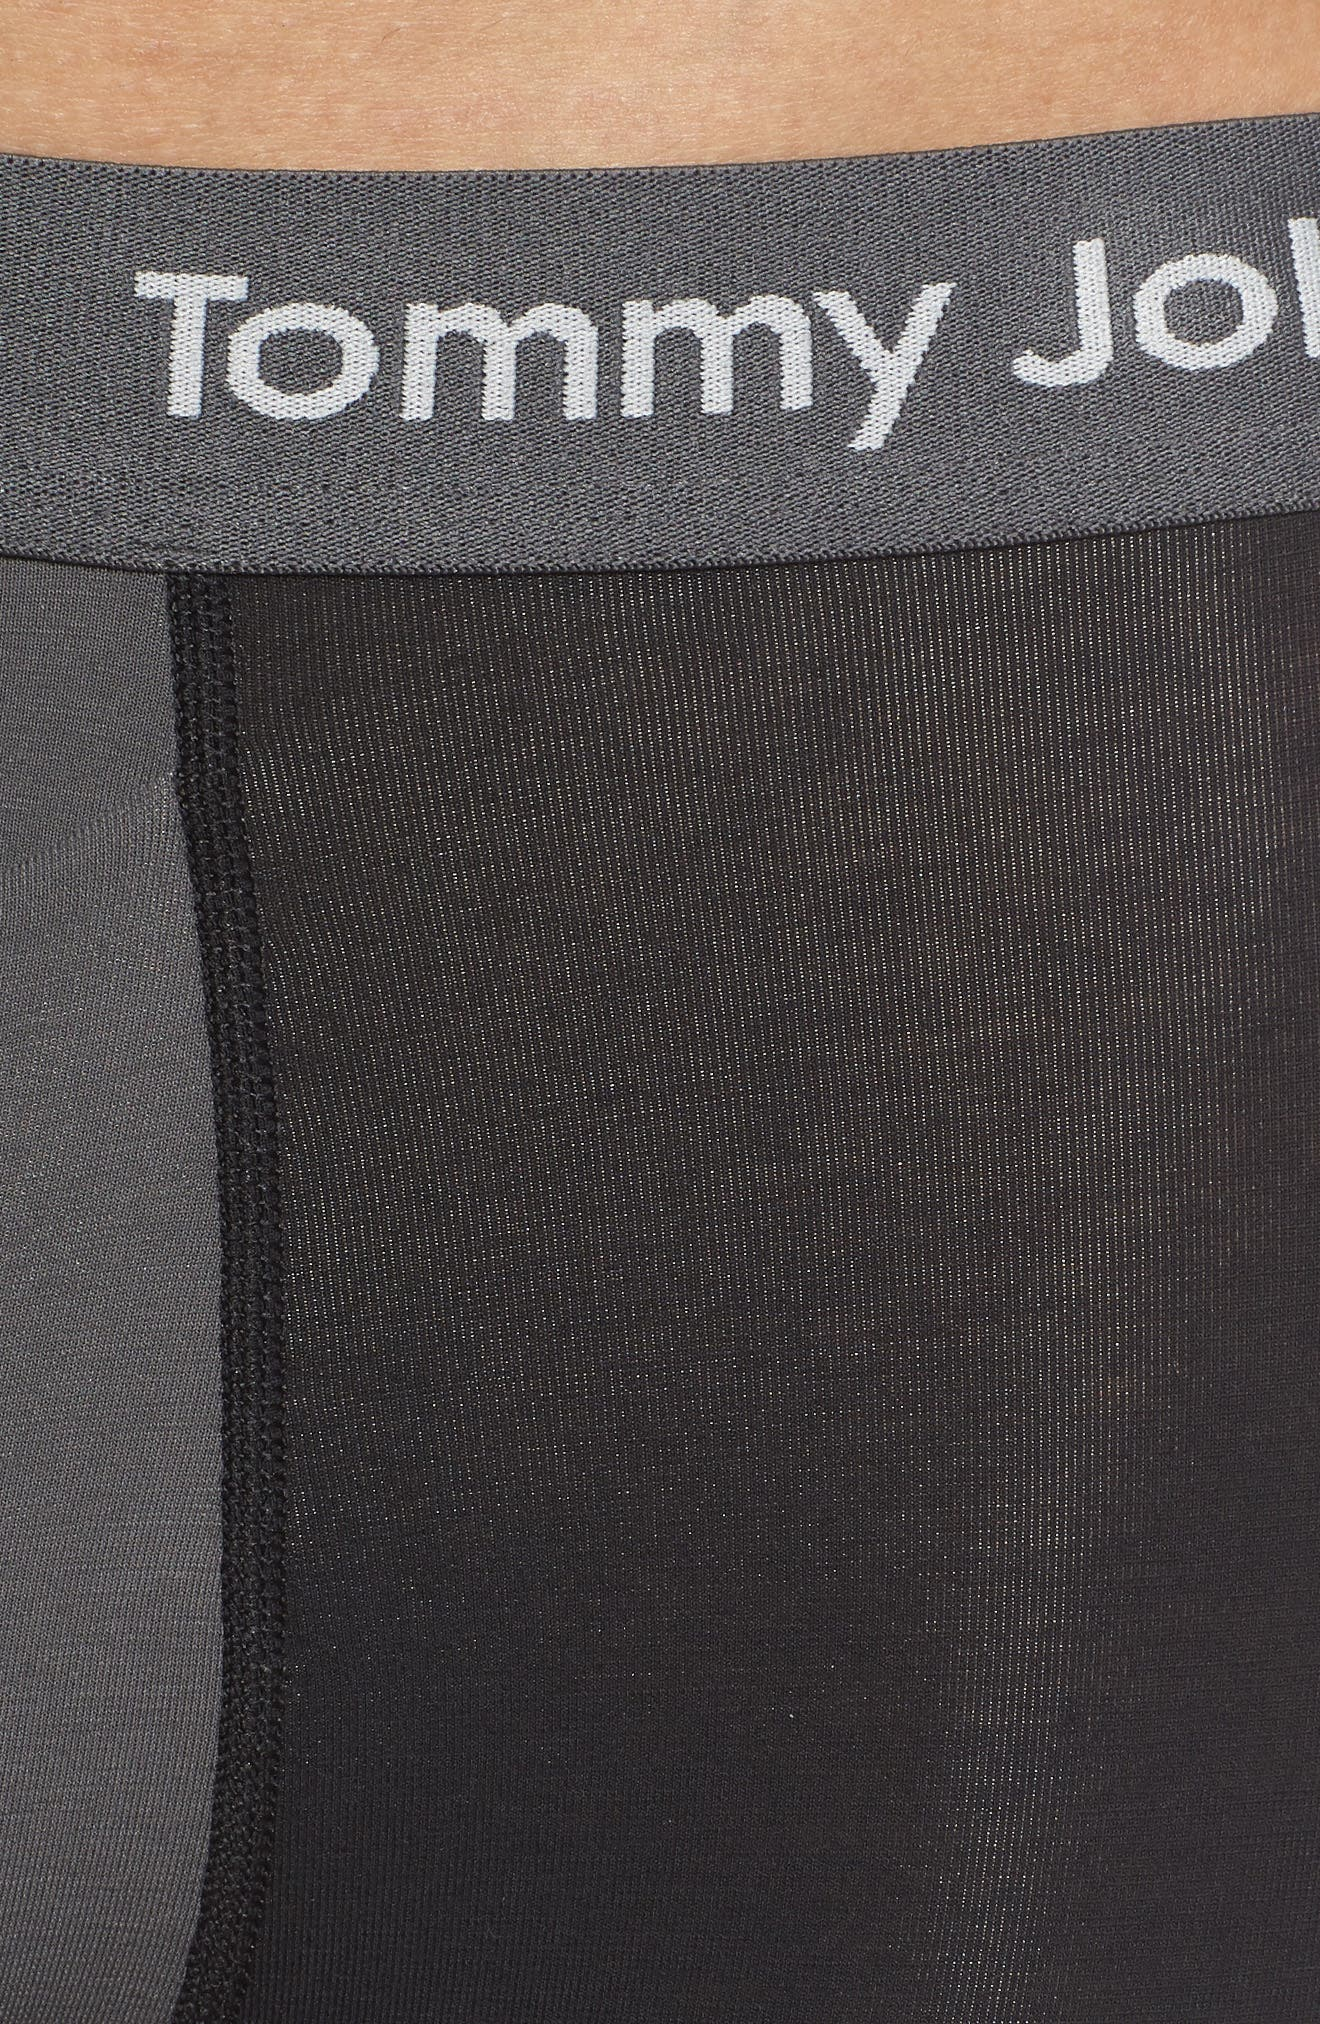 Cool Cotton Trunks,                             Alternate thumbnail 2, color,                             Black/ Iron Grey